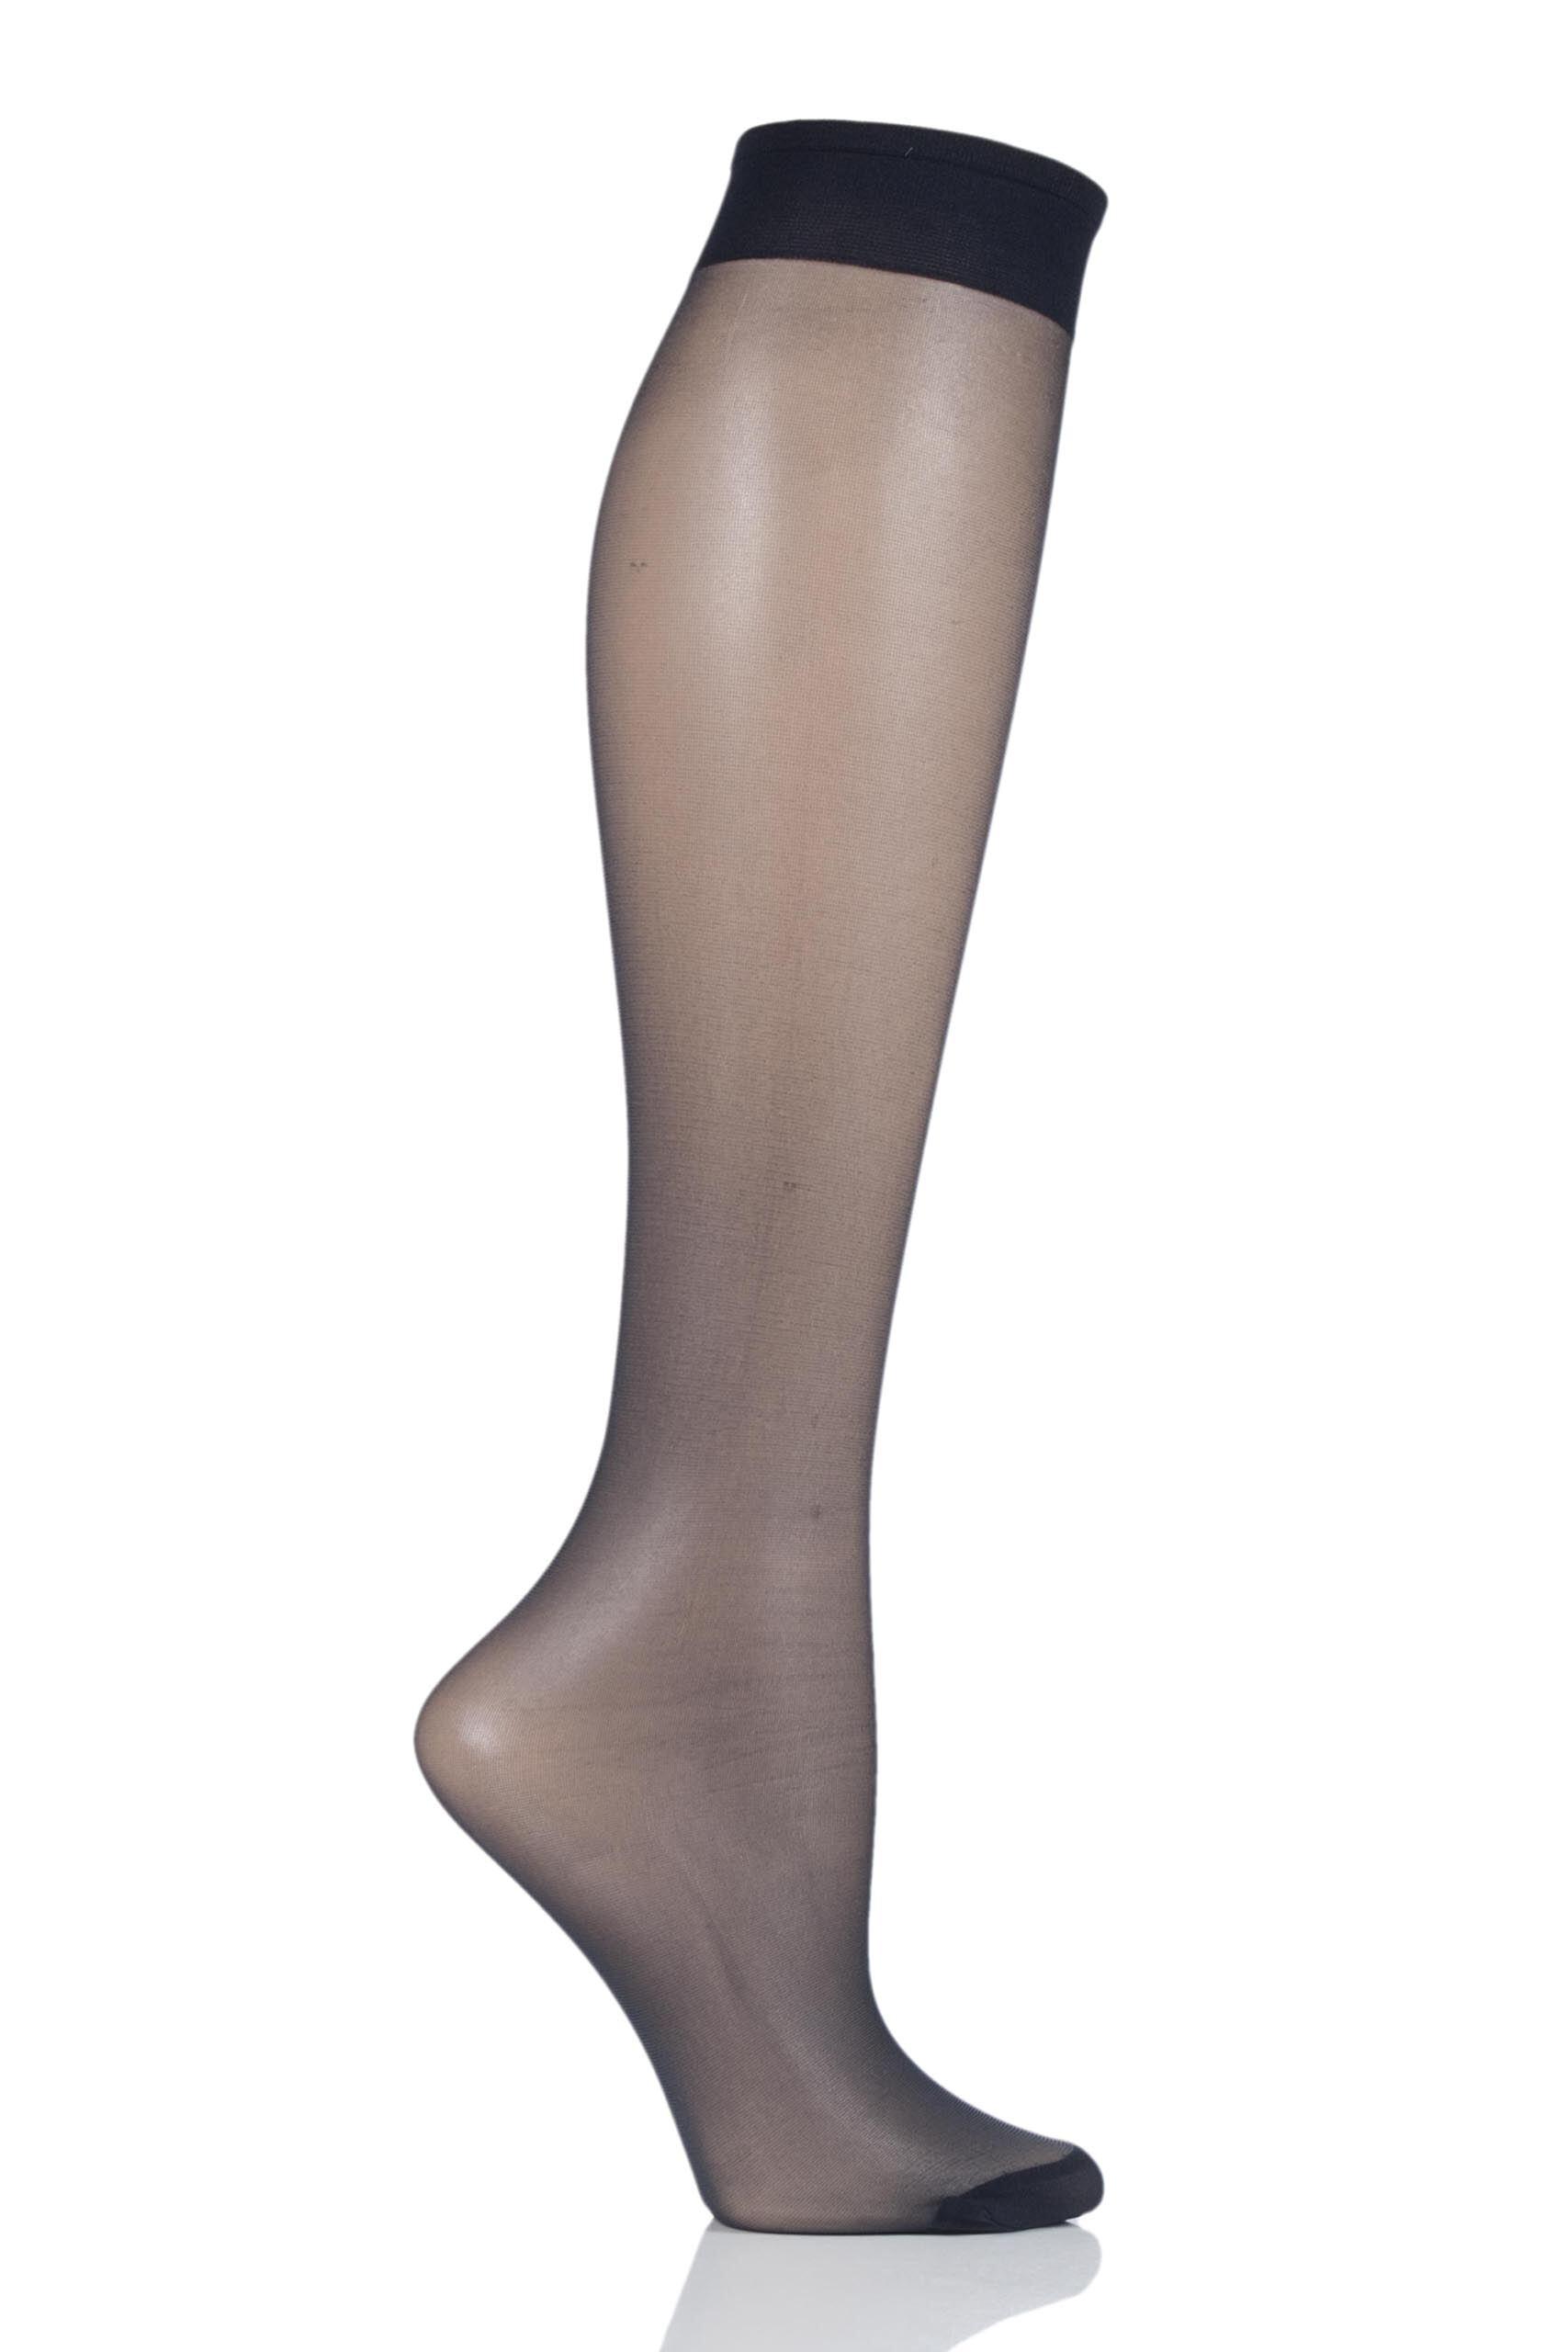 Image of 1 Pair Blumarine Class Knee High Ladies One Size - Levante